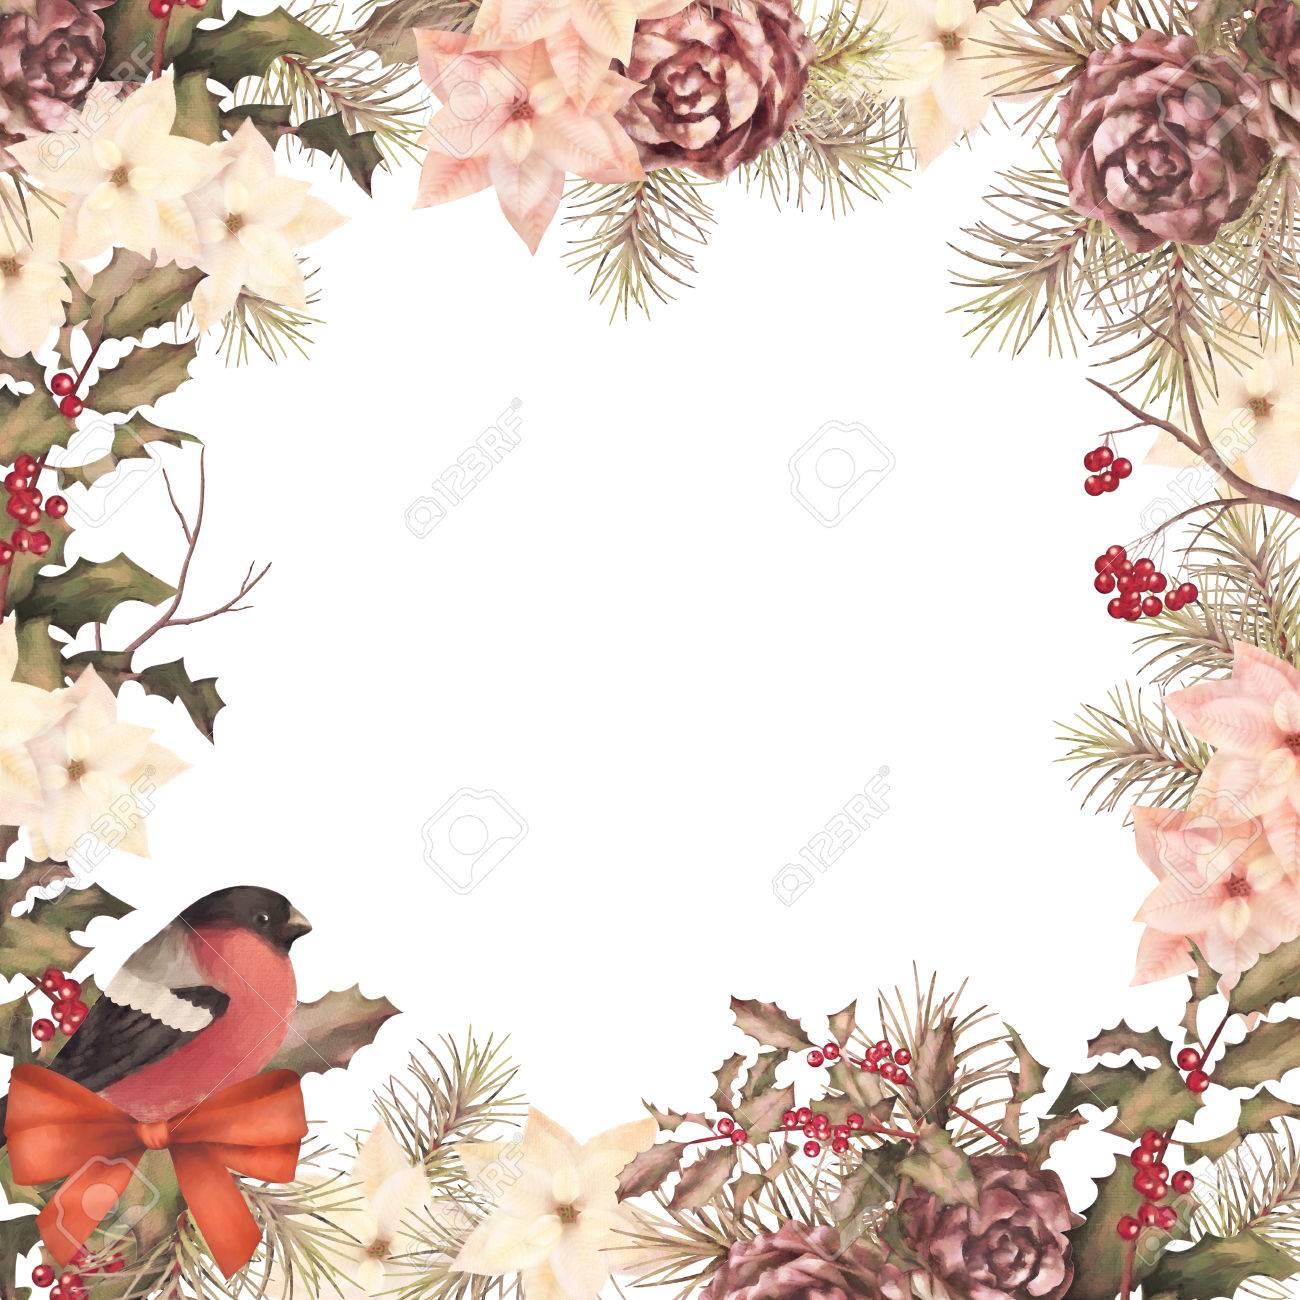 Christmas floral border stock photos freeimages com - Christmas Retro Watercolor Decorative Frame Composition Bird Bullfinch Poinsettia Flowers With Rowan And Holly